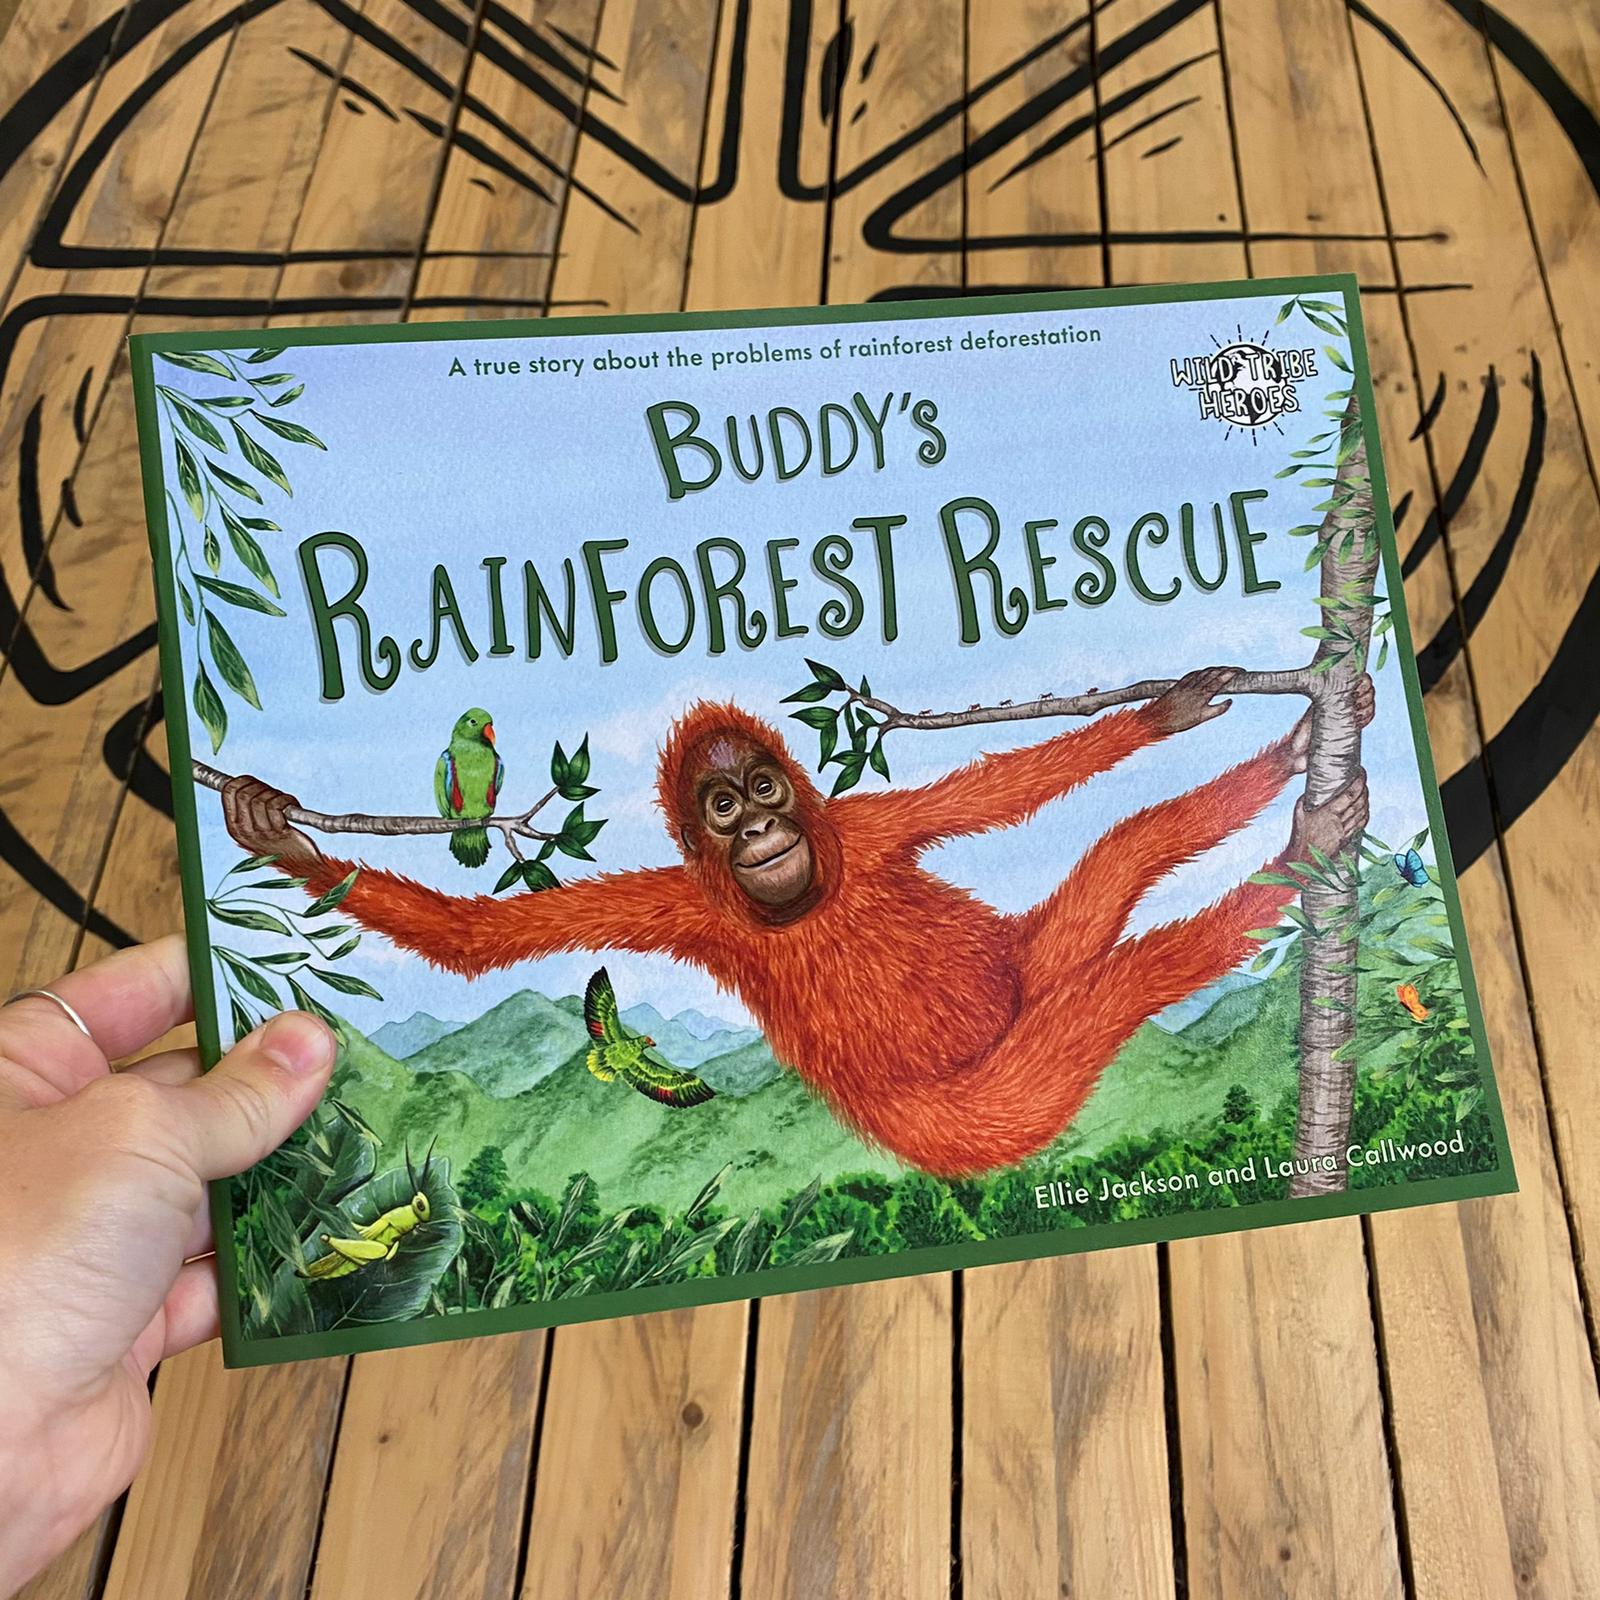 Buddy's Rainforest Rescue | Wild Tribe